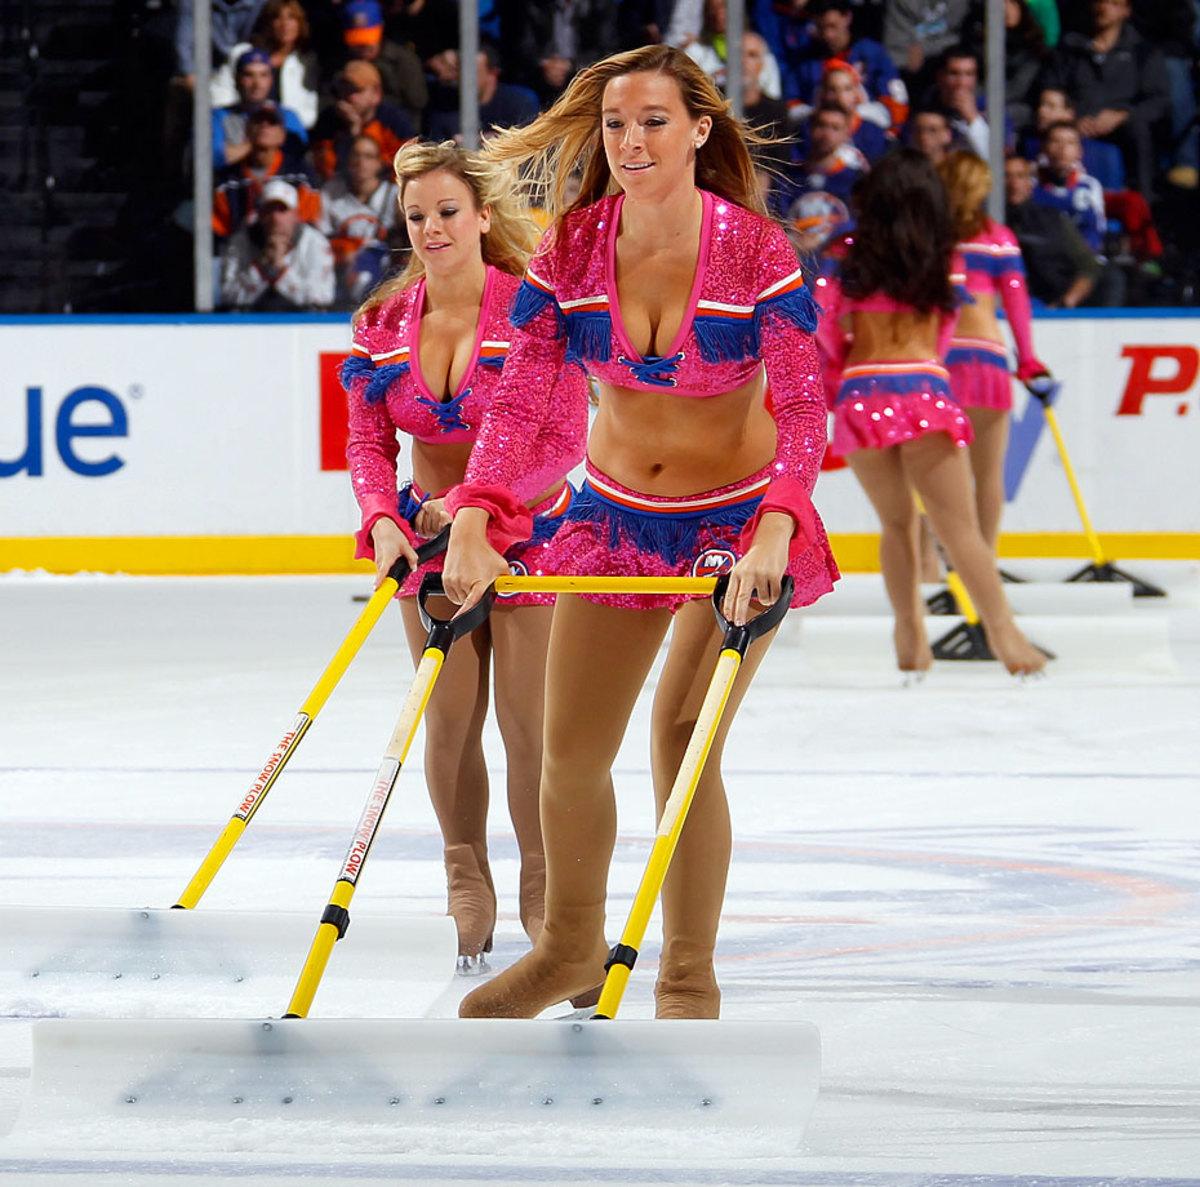 New-York-Islanders-Ice-Girls-458177202_10.jpg